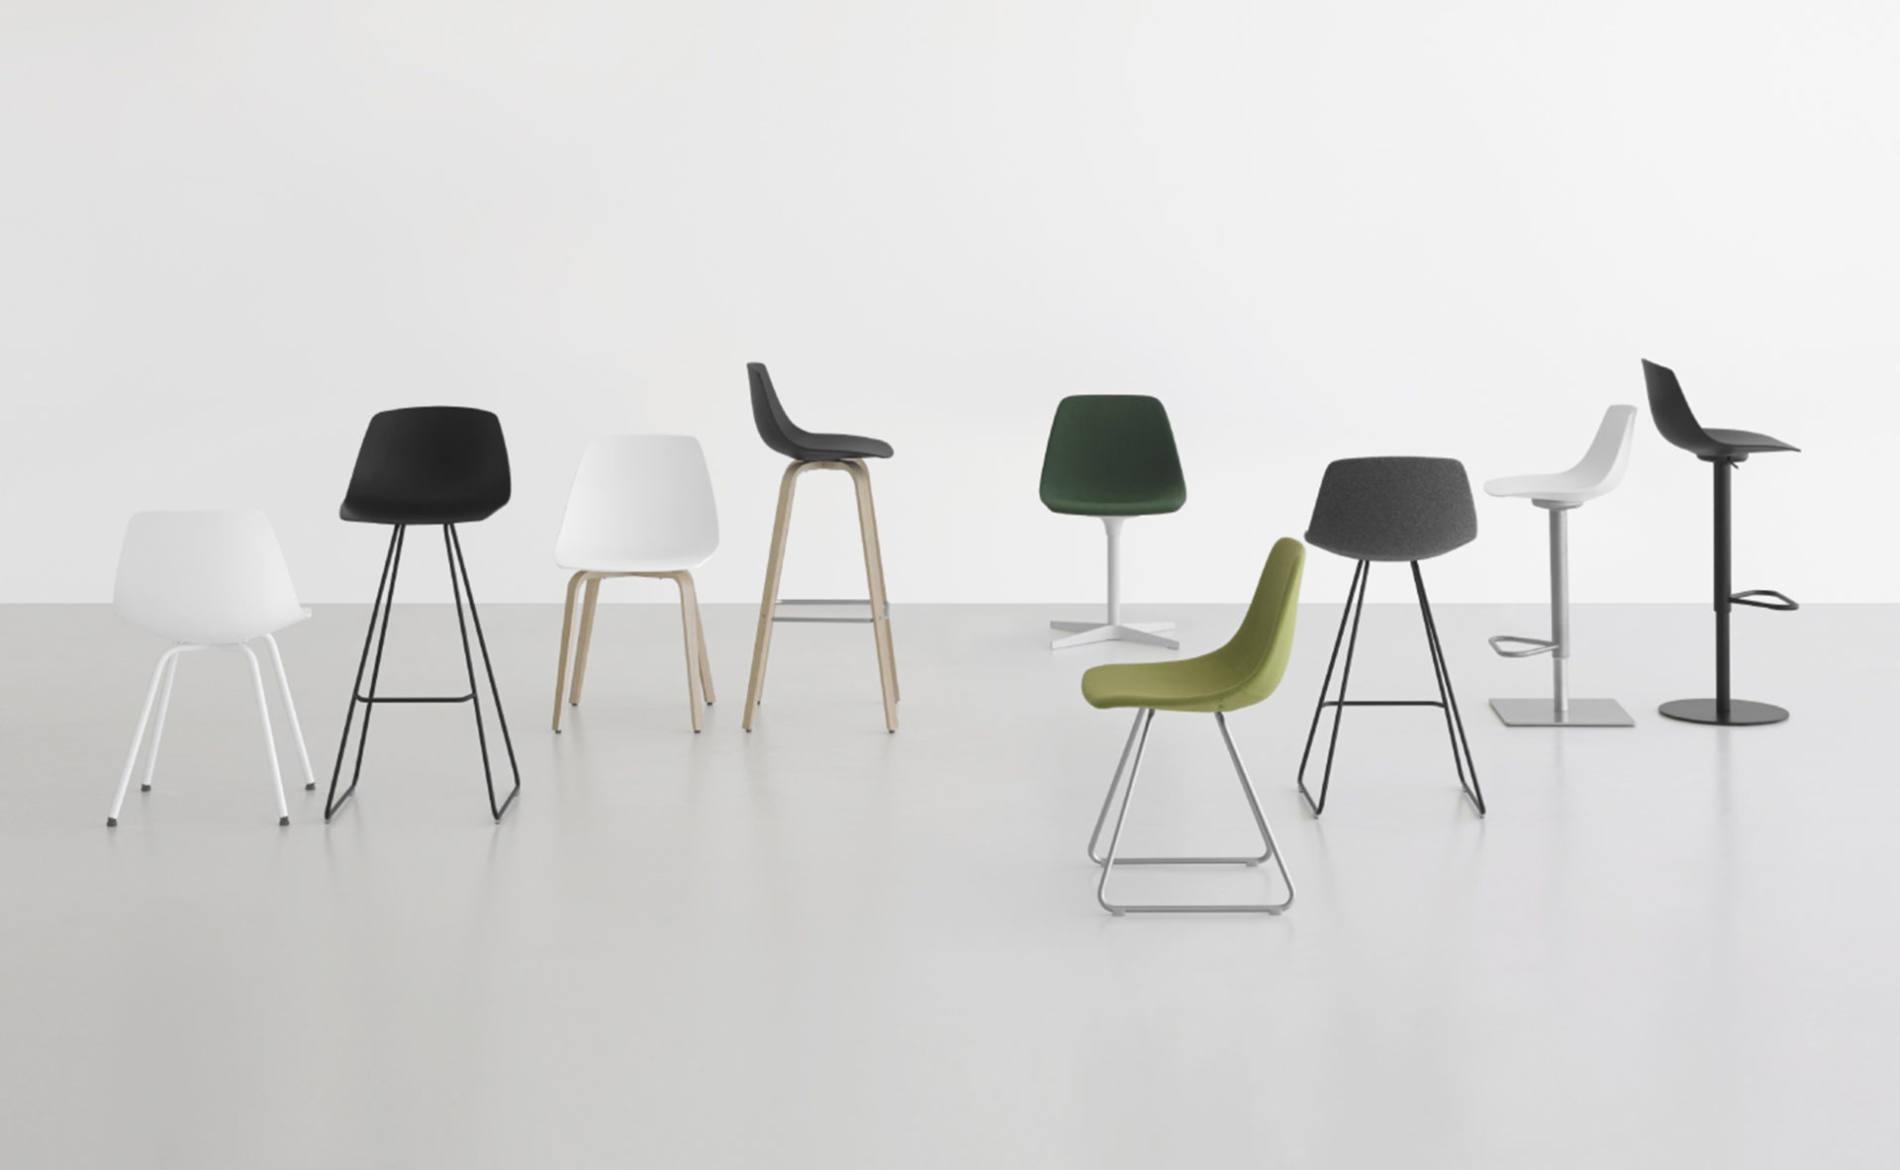 Miunn Barhocker und Stuhl (LaPalma)